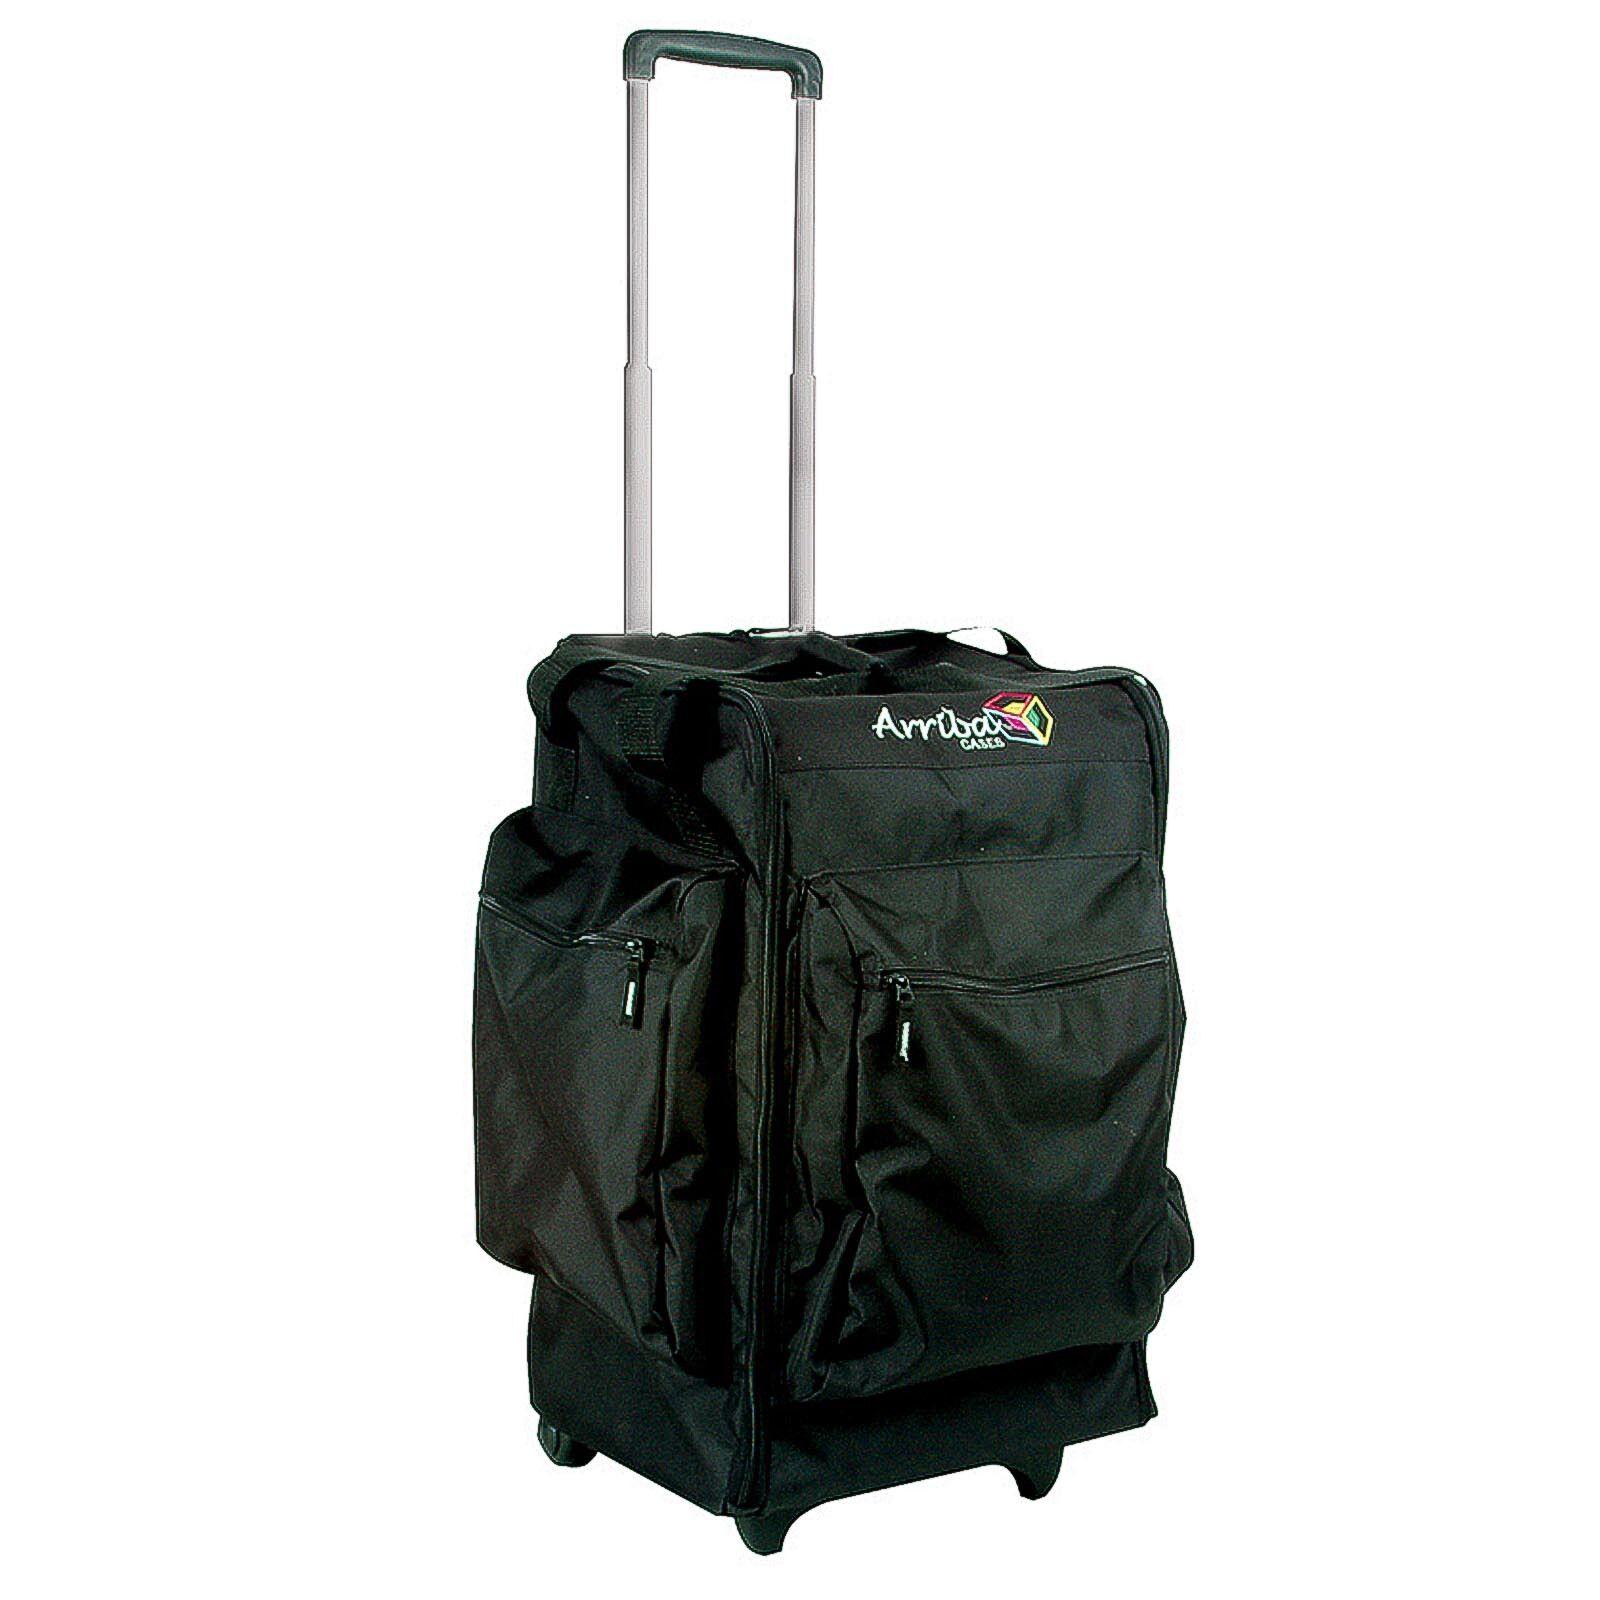 Arriba AC-165 DJ Band Padded Lighting Moving Head Gear Travel Bag Case 13x14x23